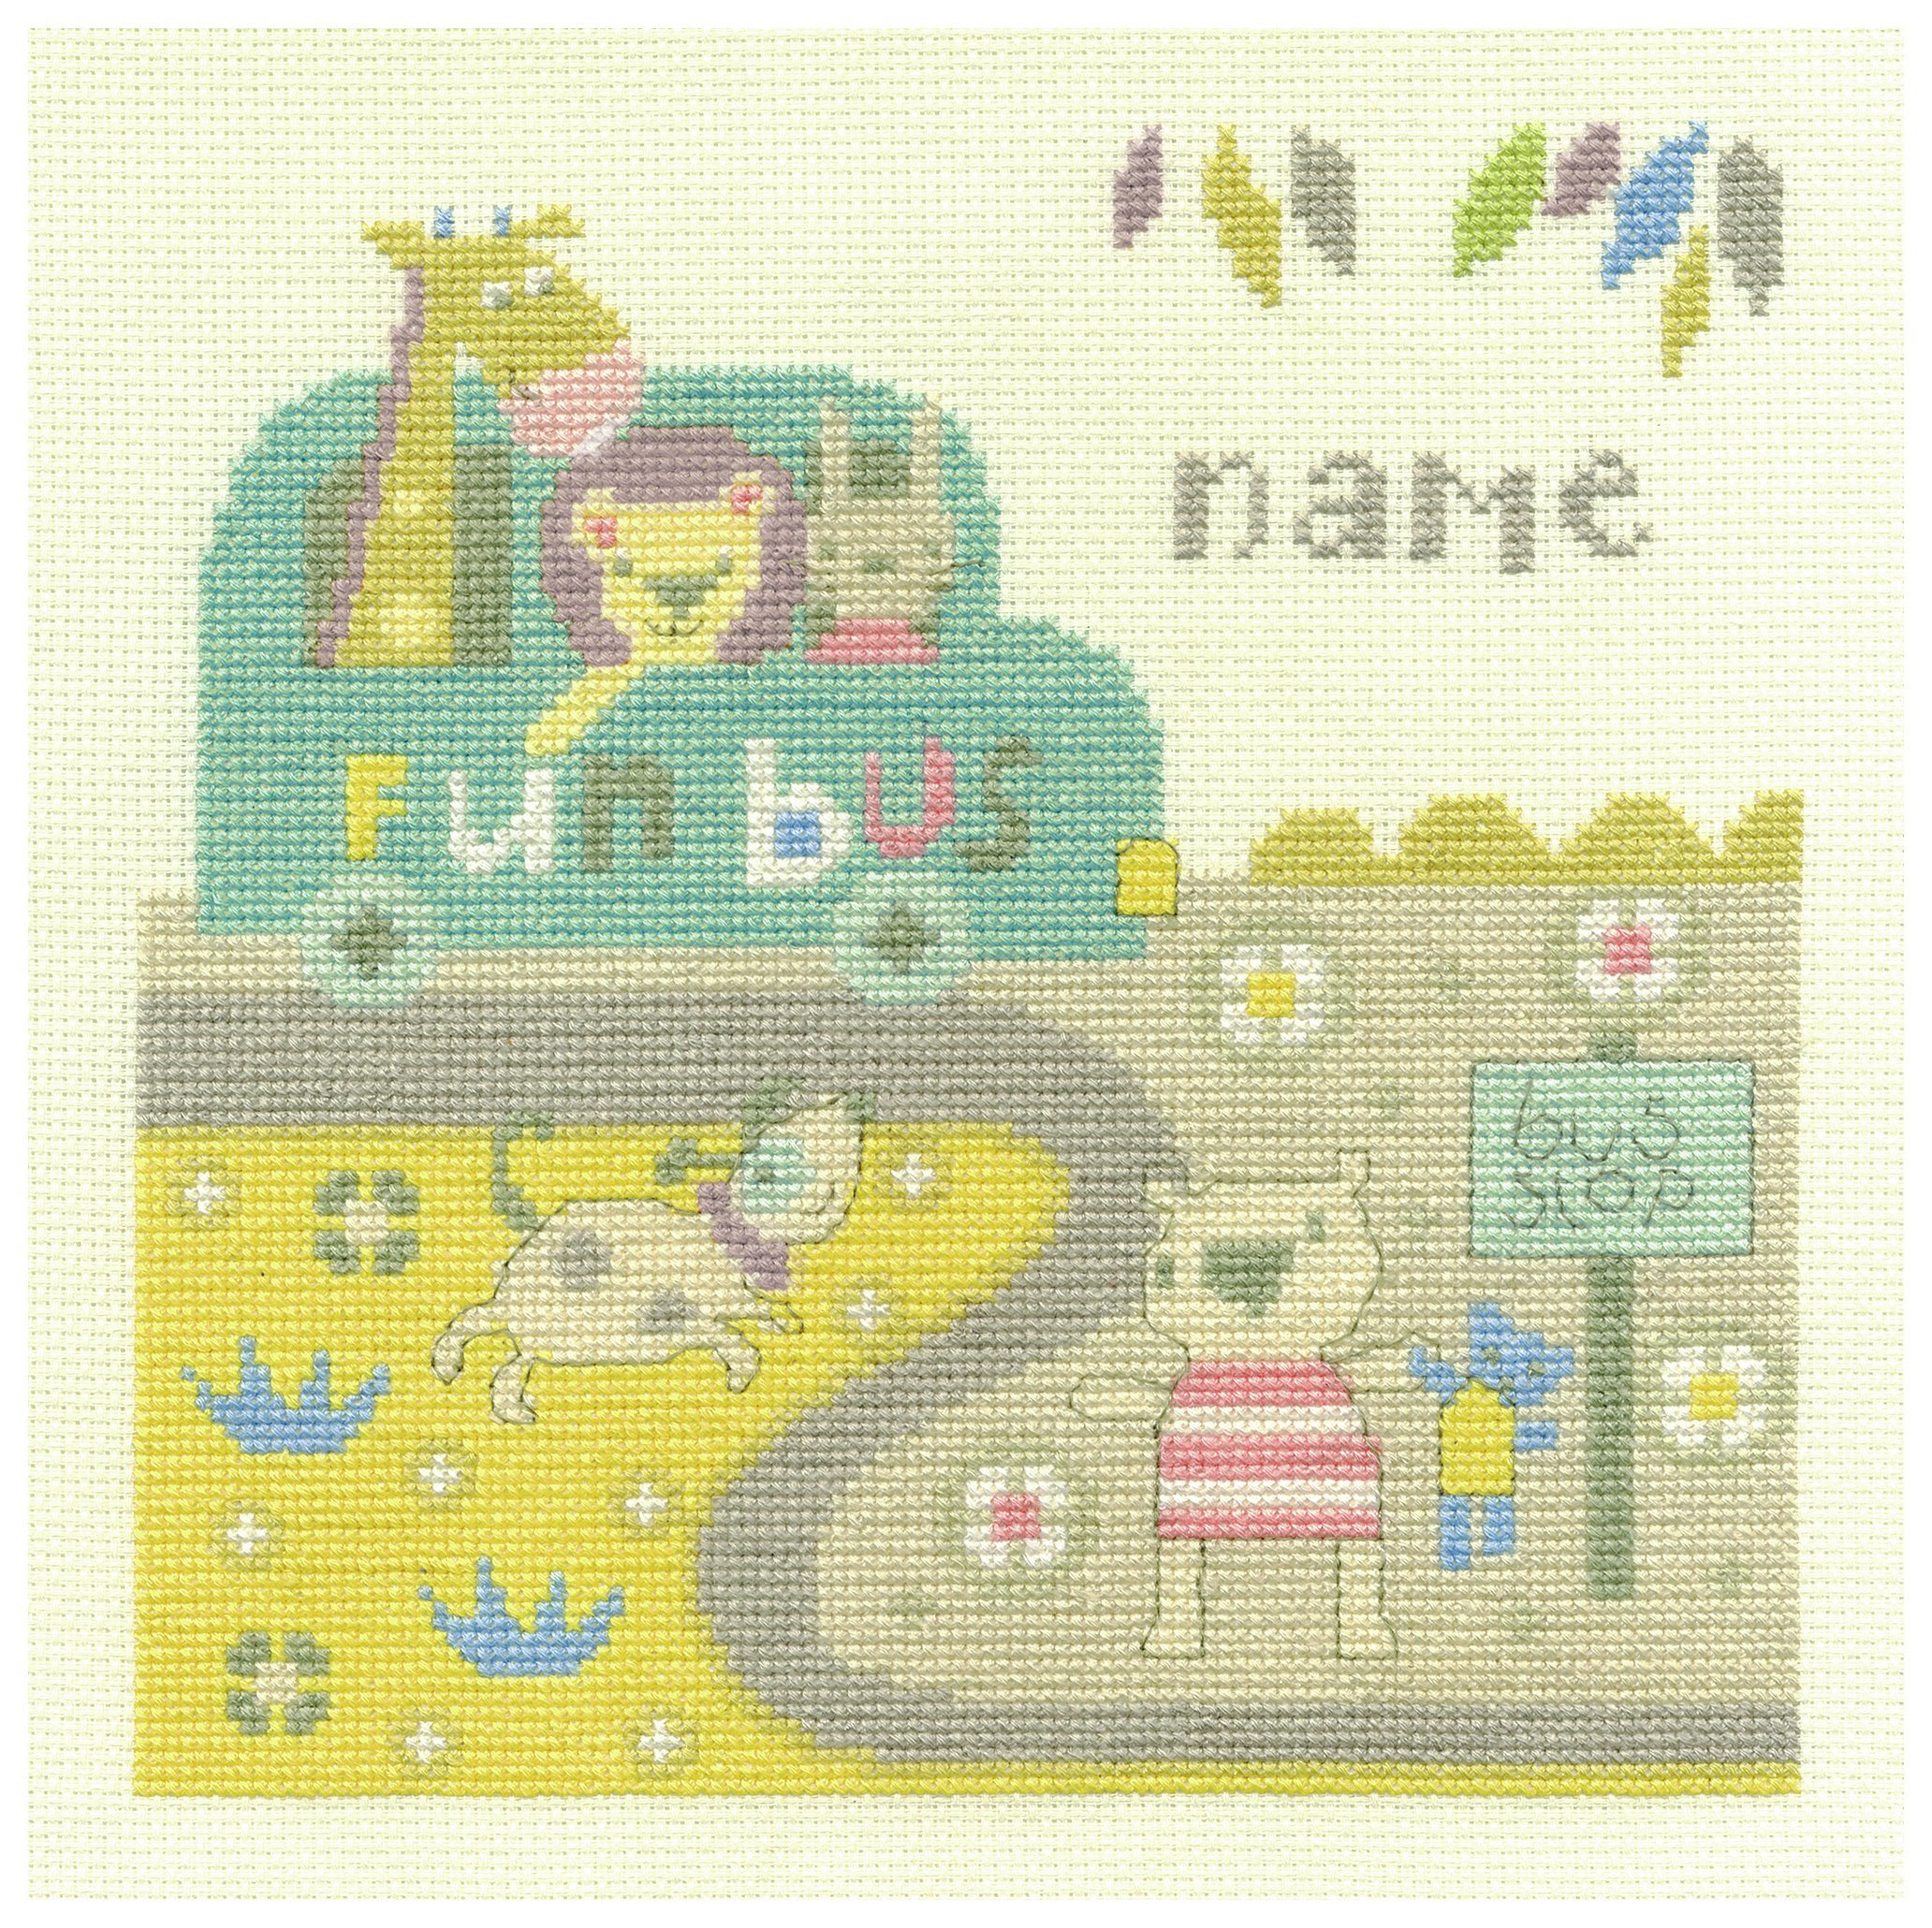 Baby Bus Stop - Cross Stitch Kit lowest price